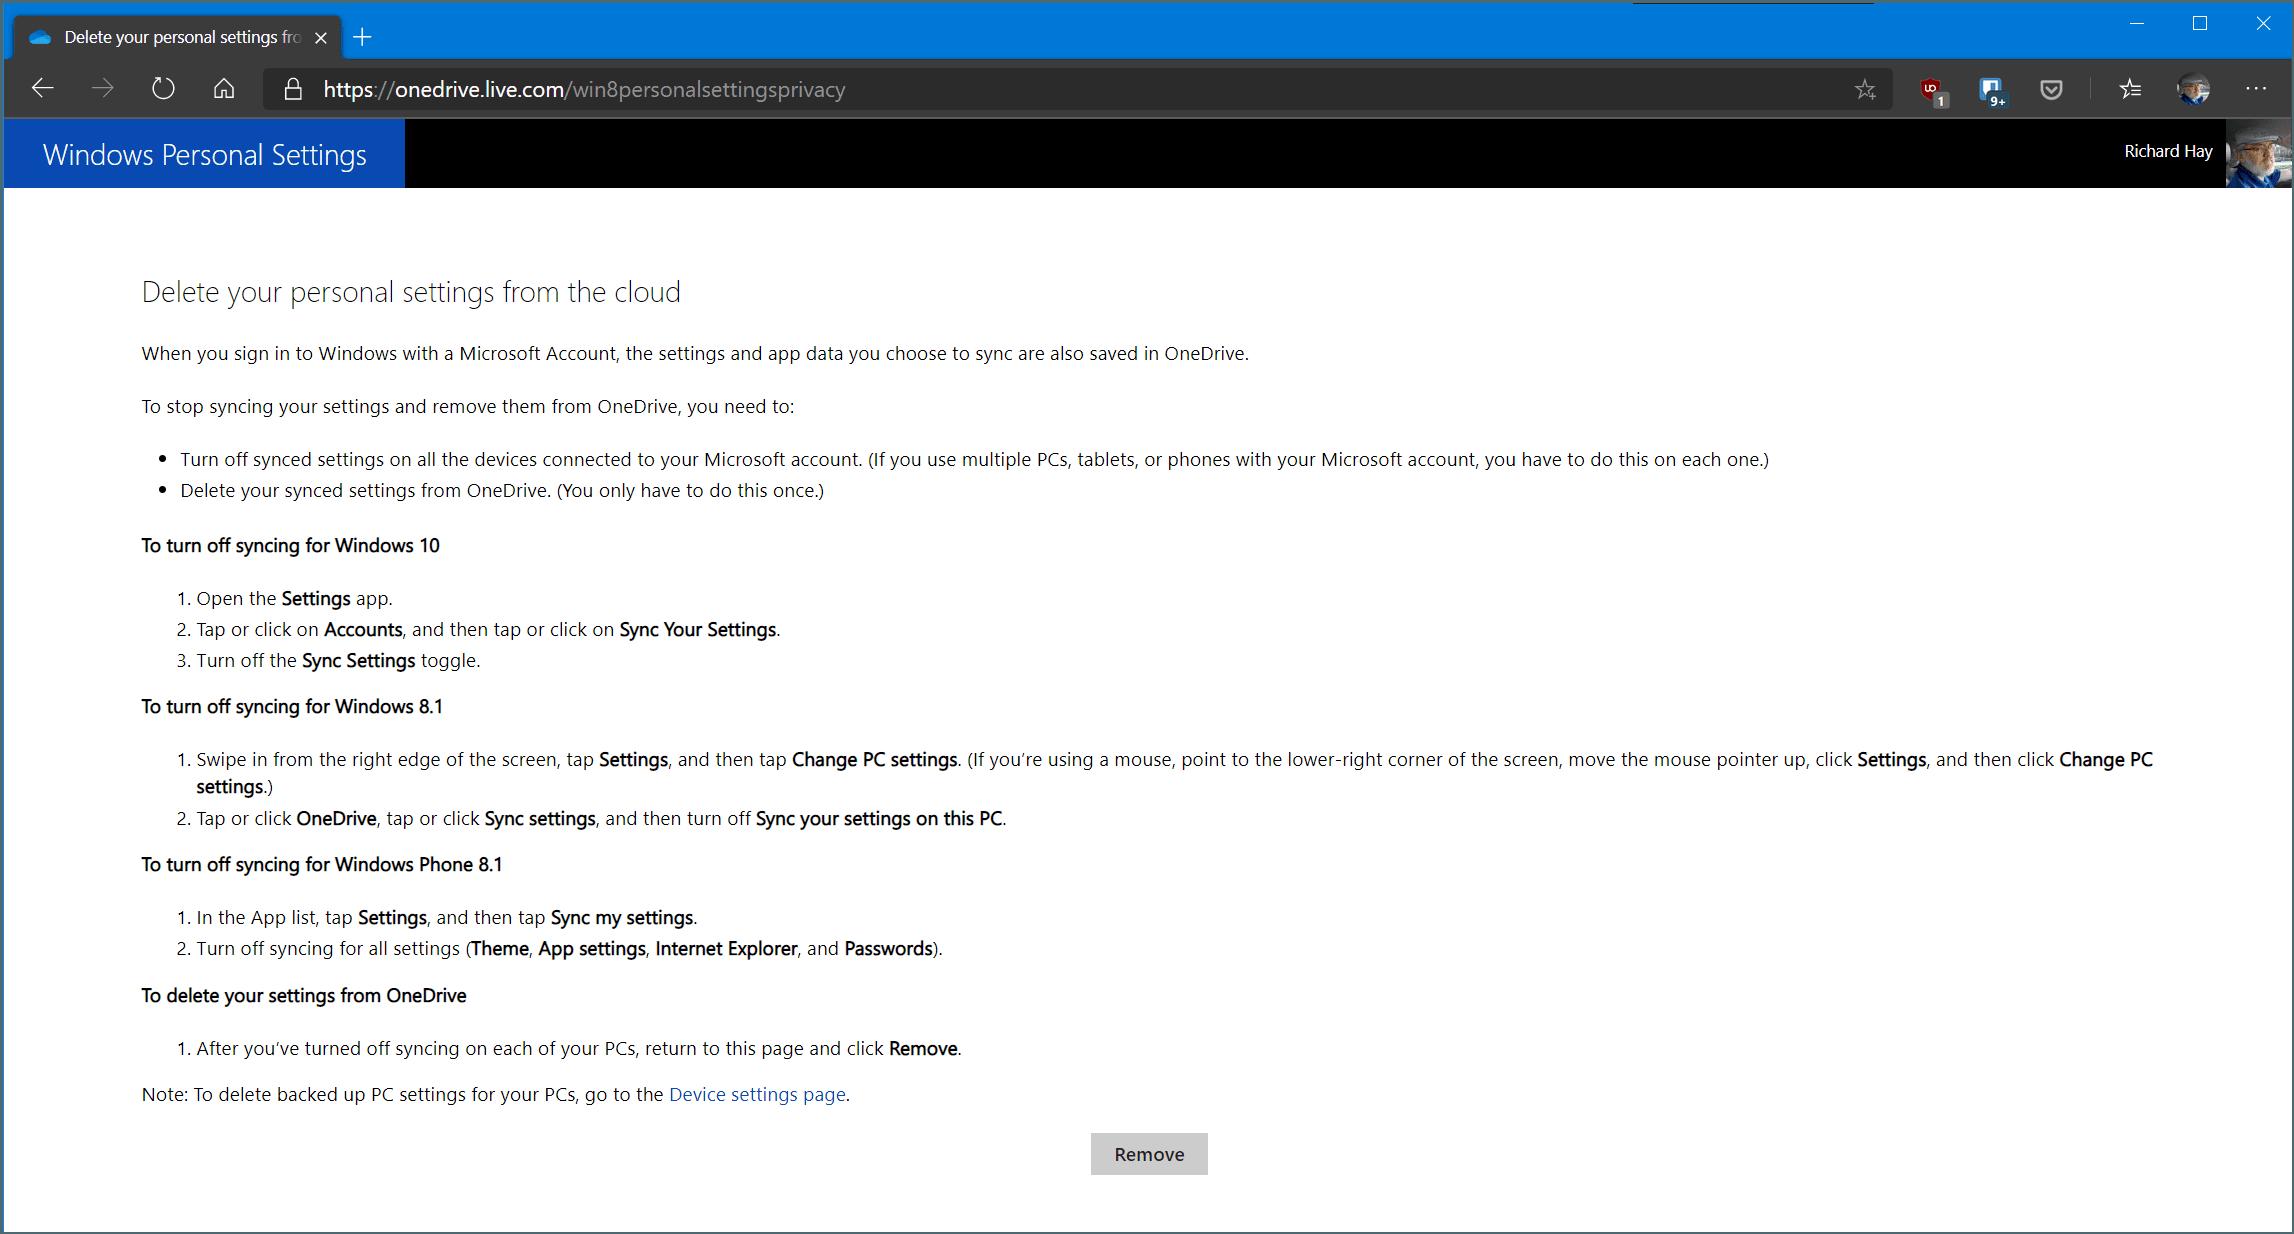 Windows Personal Settings Dialog